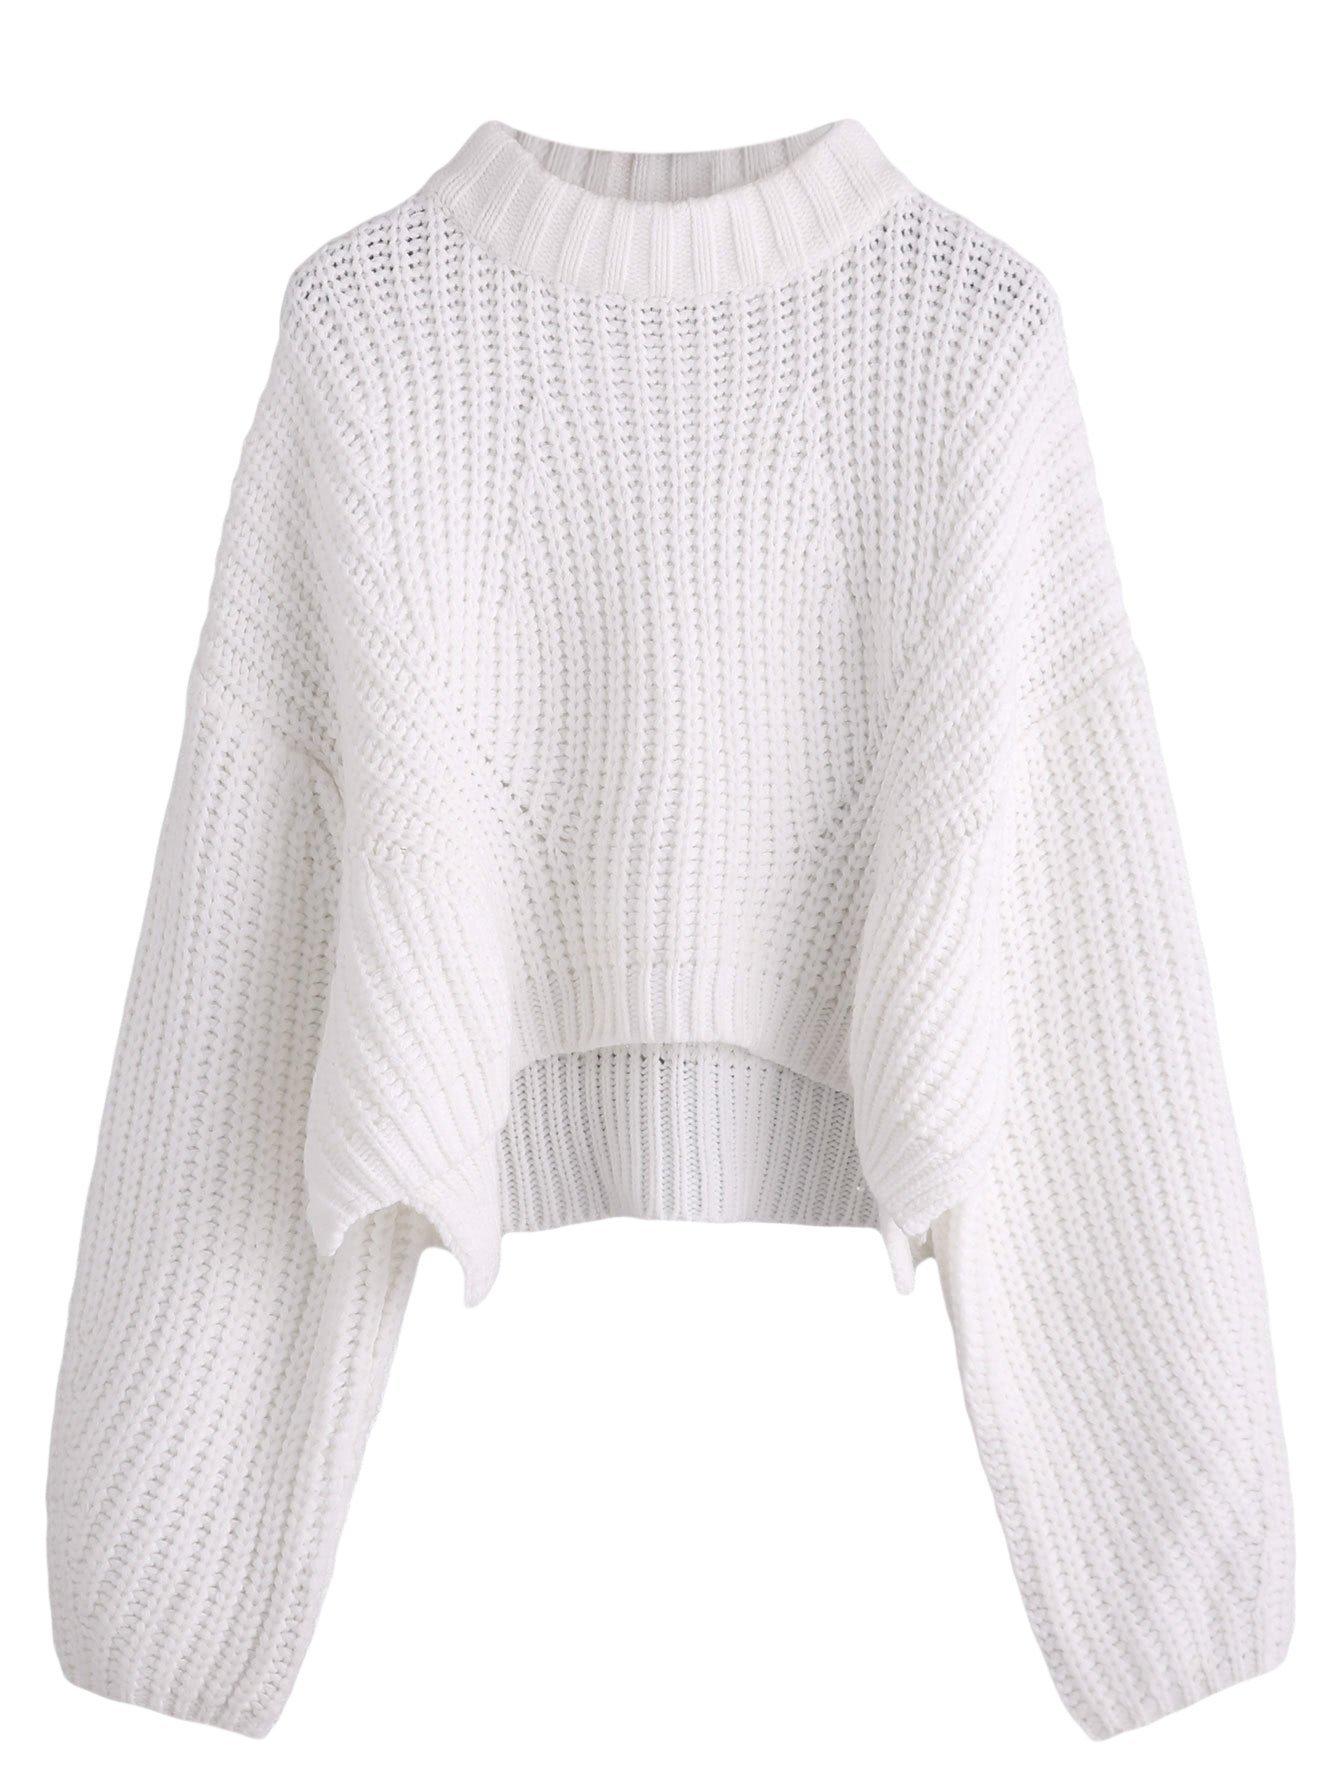 SheIn Women's Mock Neck Drop Shoulder Oversized Batwing Sleeve Crop Top Sweater White One-Size